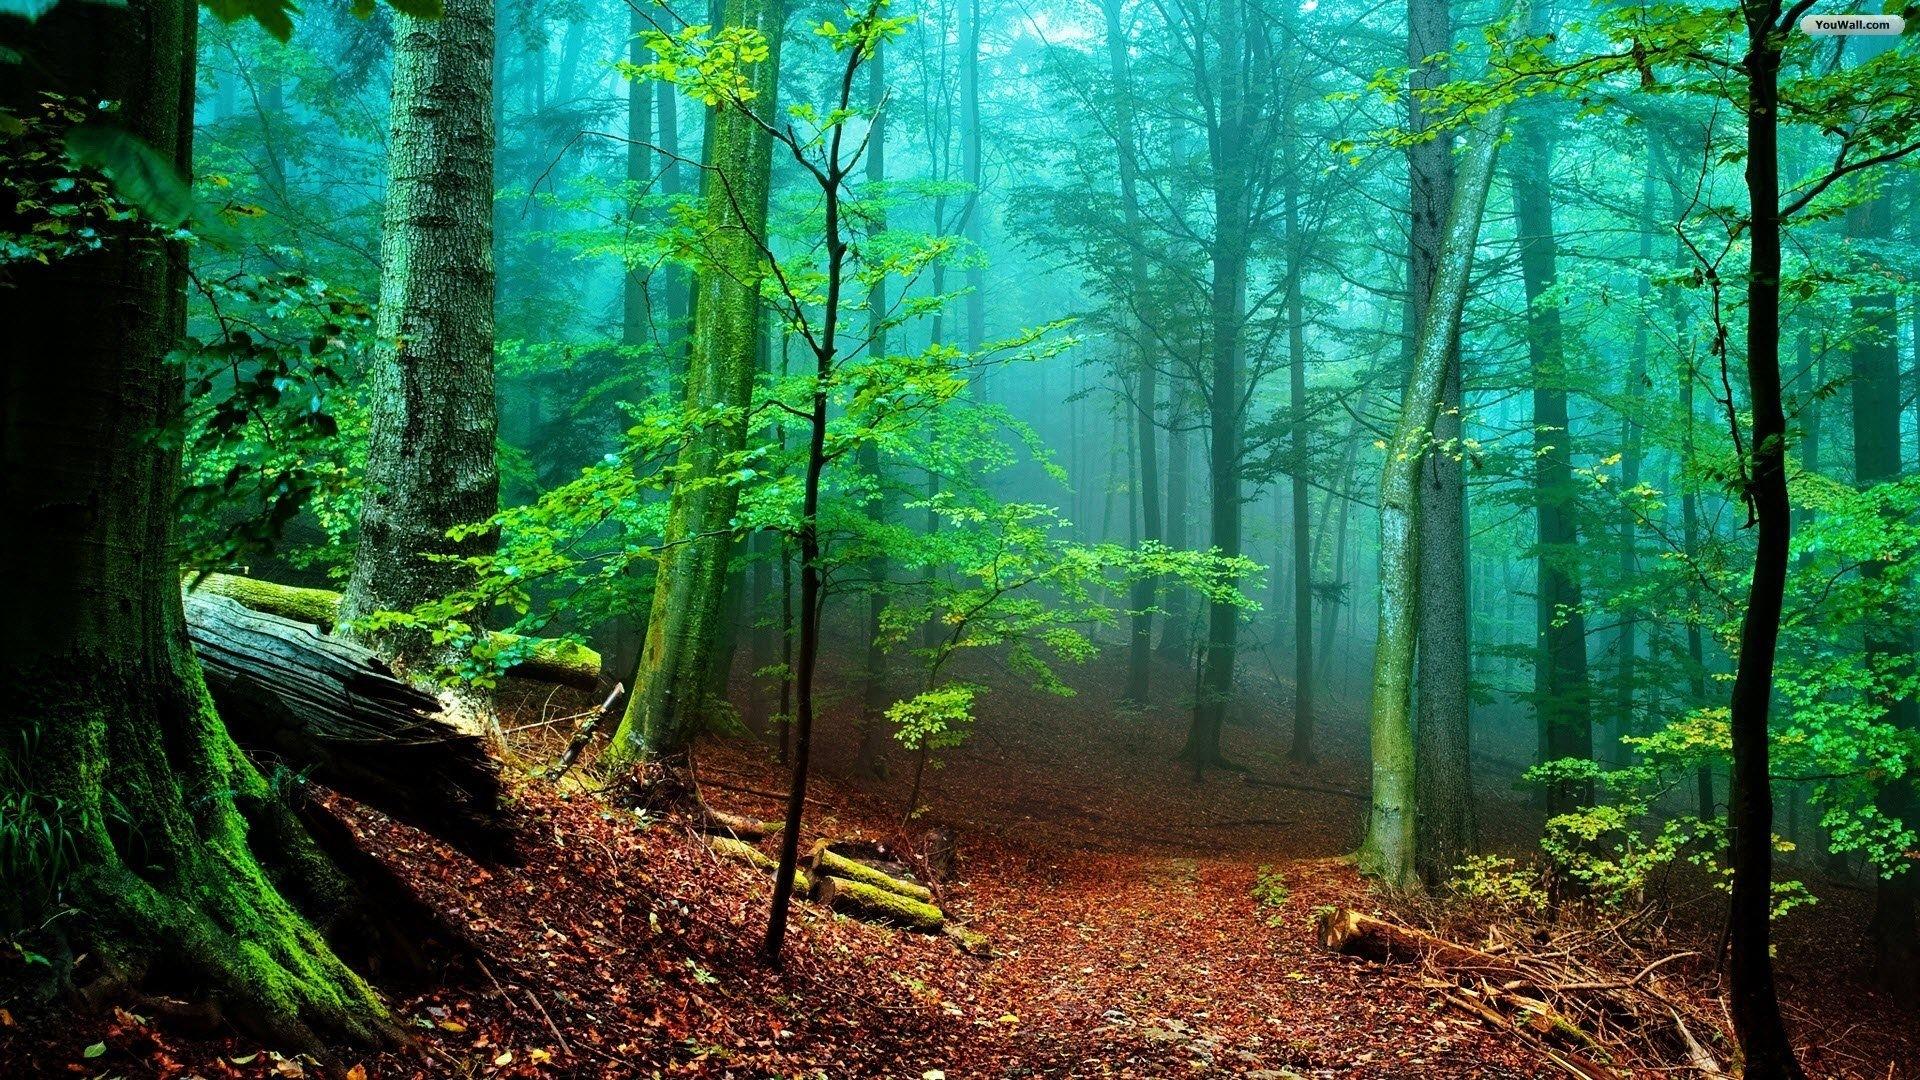 karditsa   man   pinterest   wallpaper, beautiful forest and forest